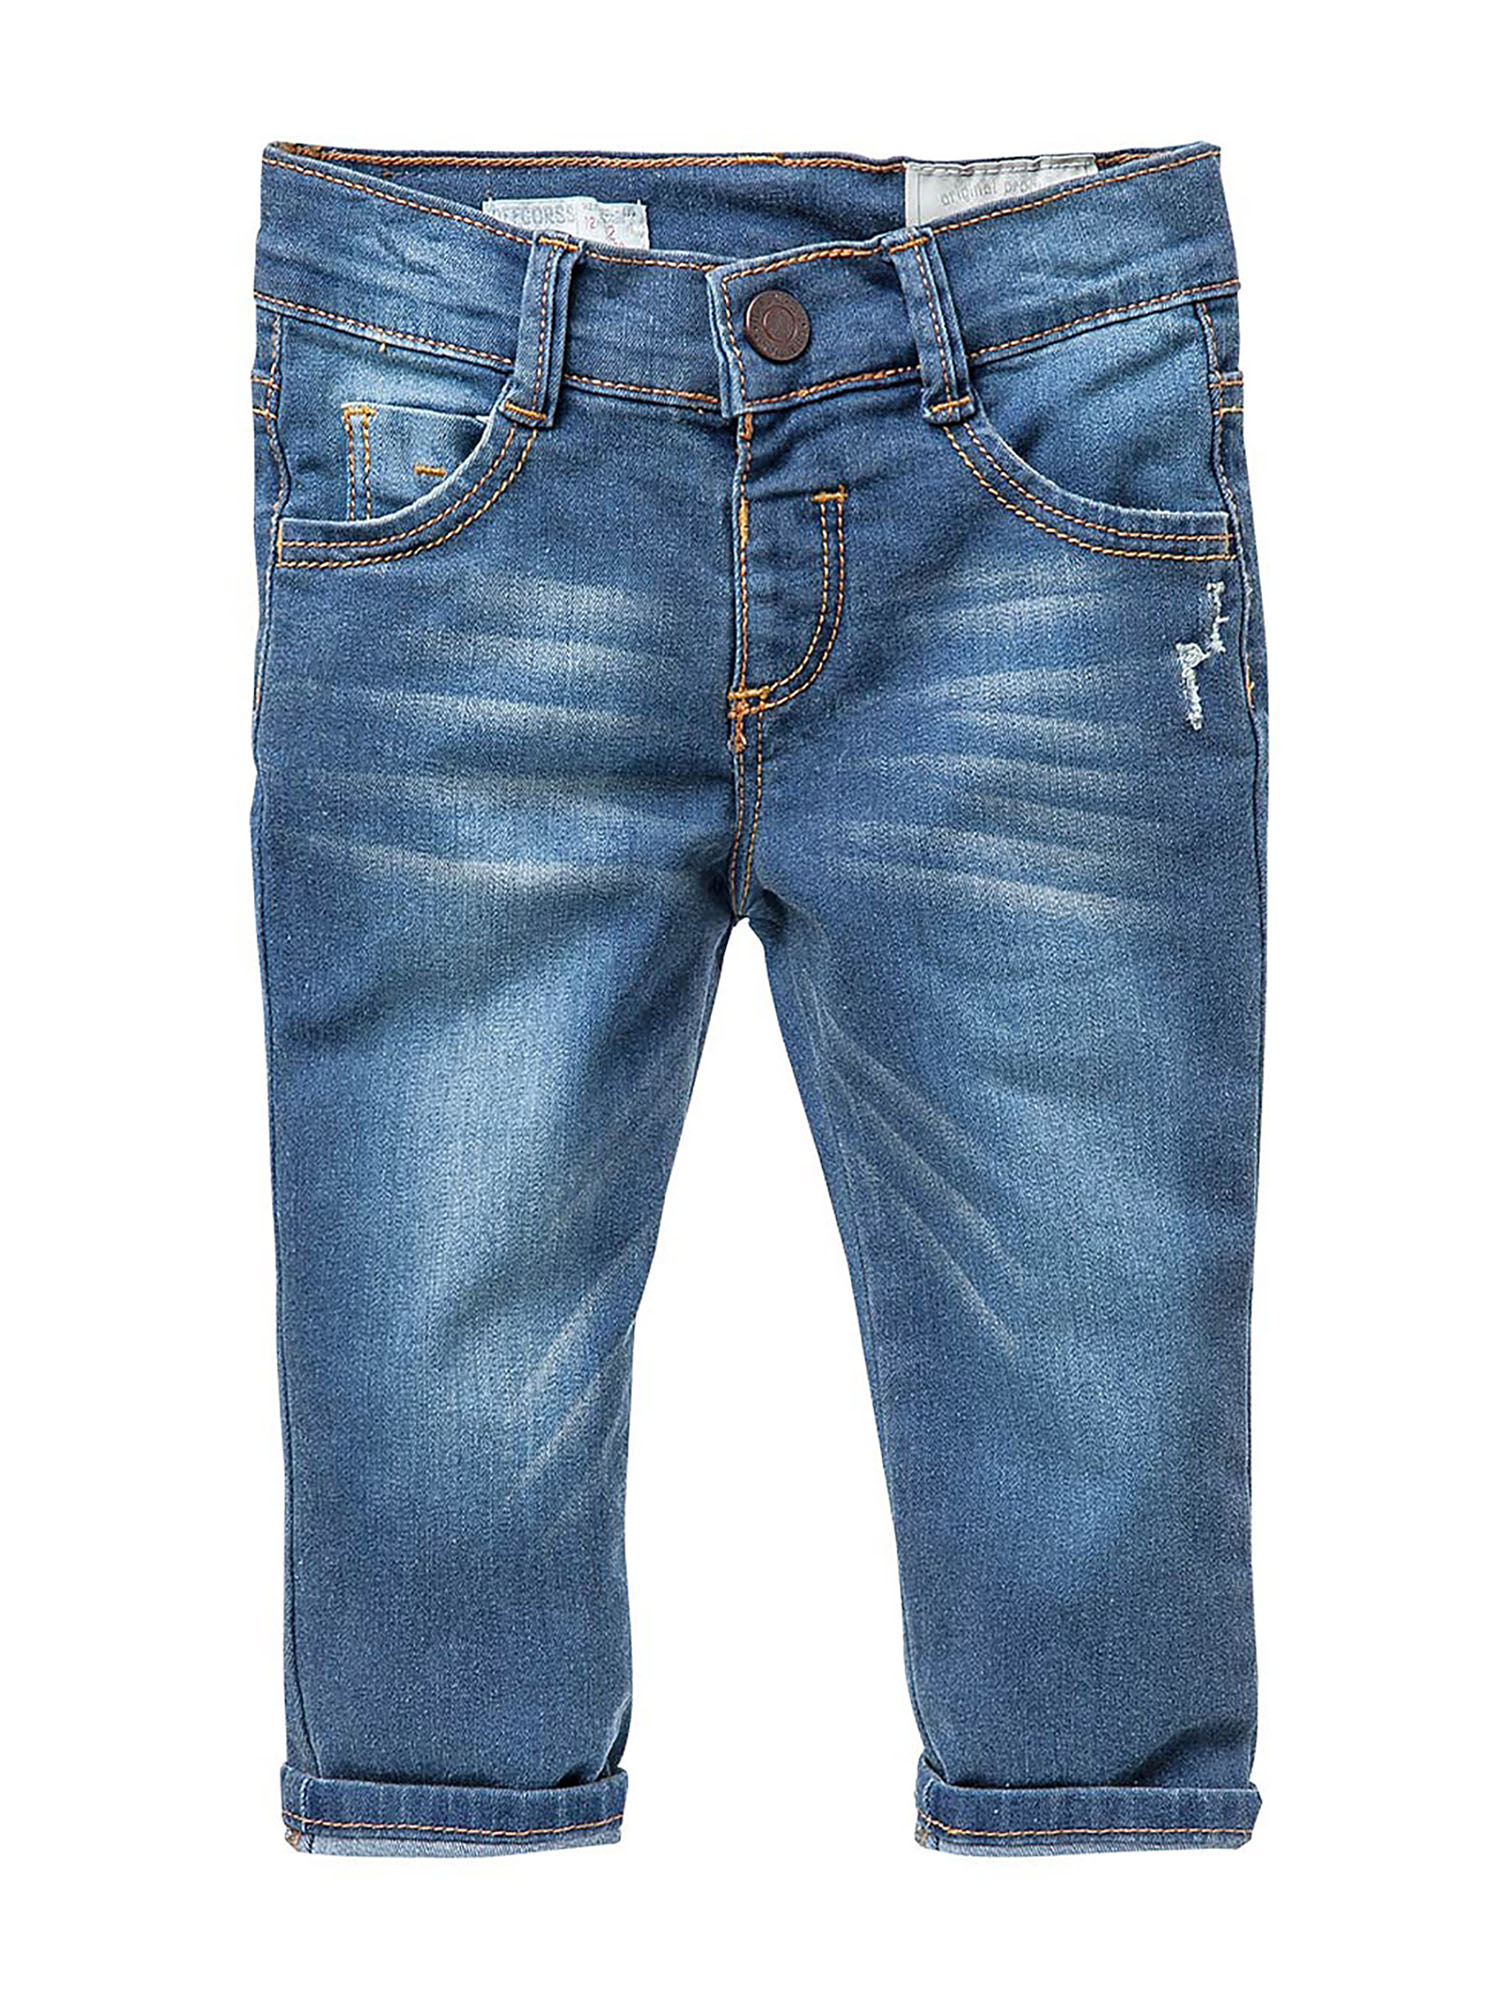 OFFCORSS Toddle Boy Stylish Denim Jeans For Kids Pantalones Para Niños